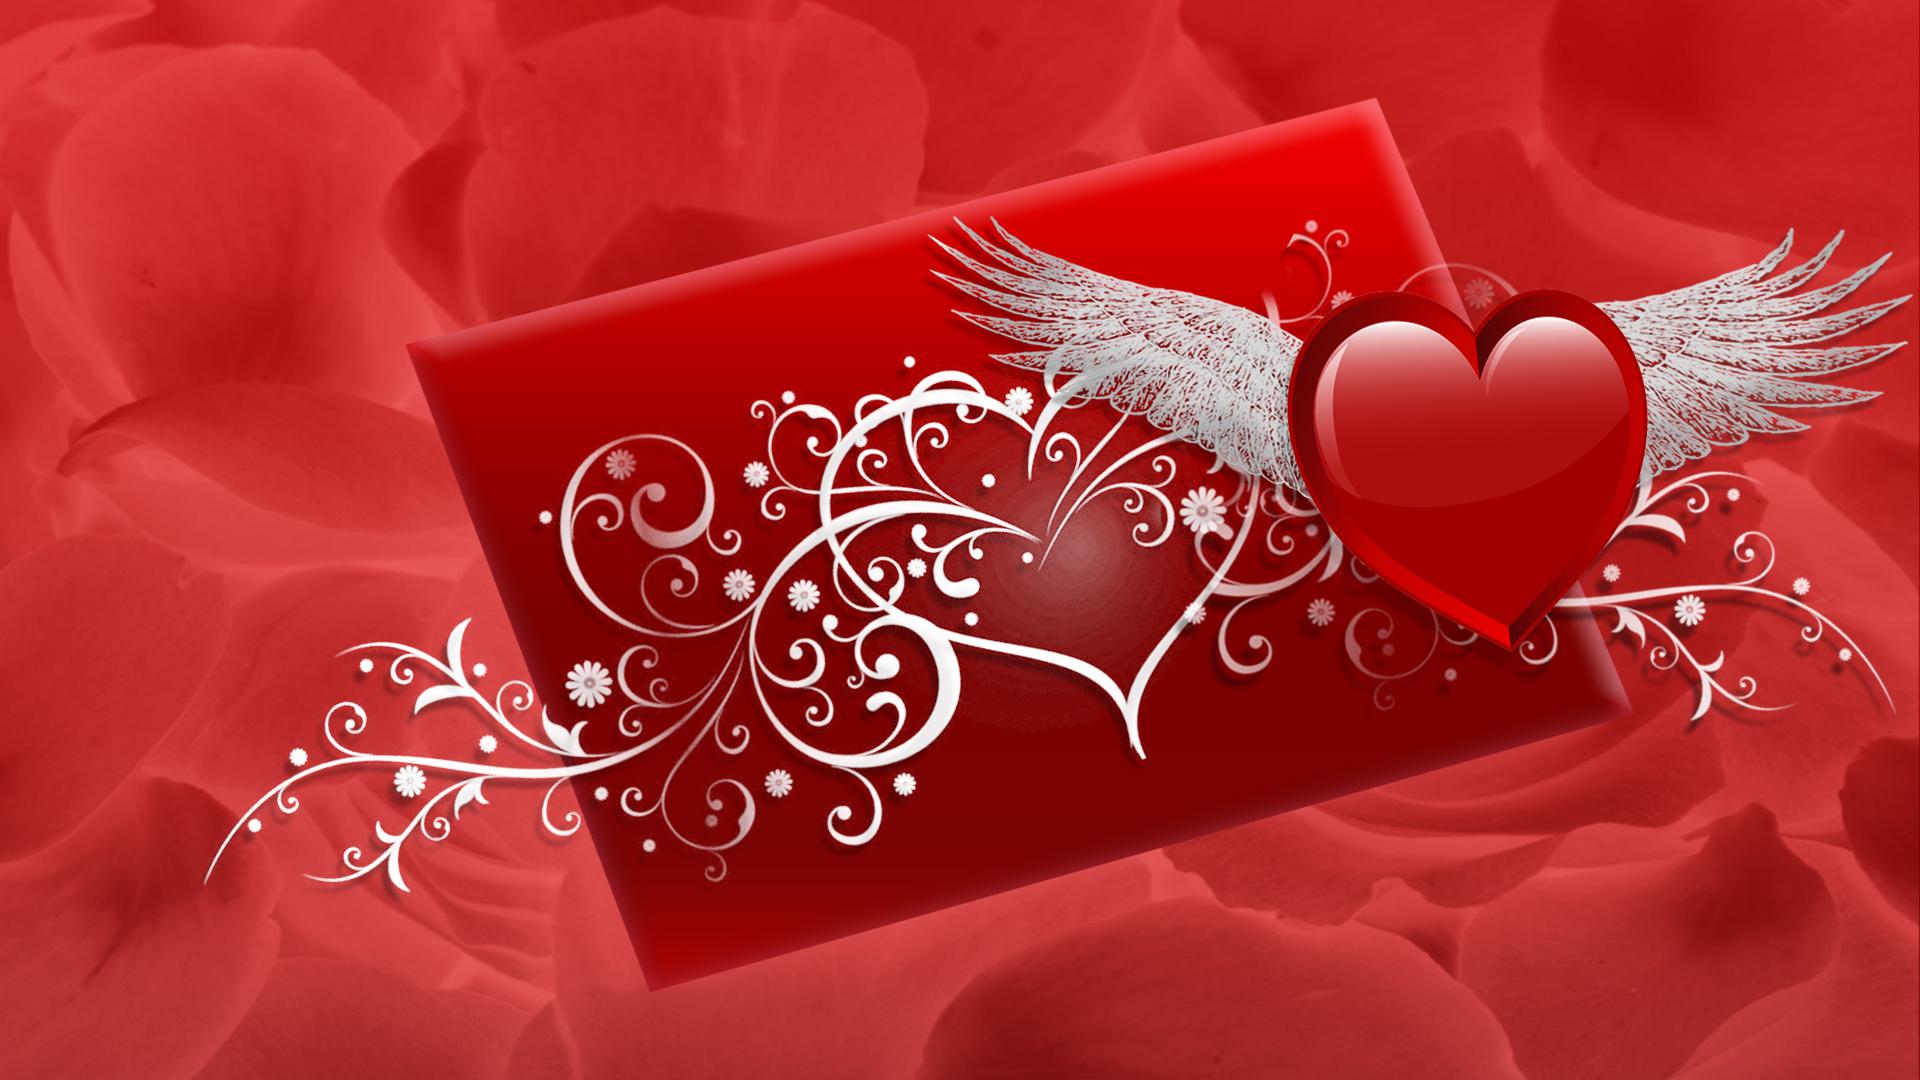 Valentine Screensaver wallpaper   342896 1920x1080